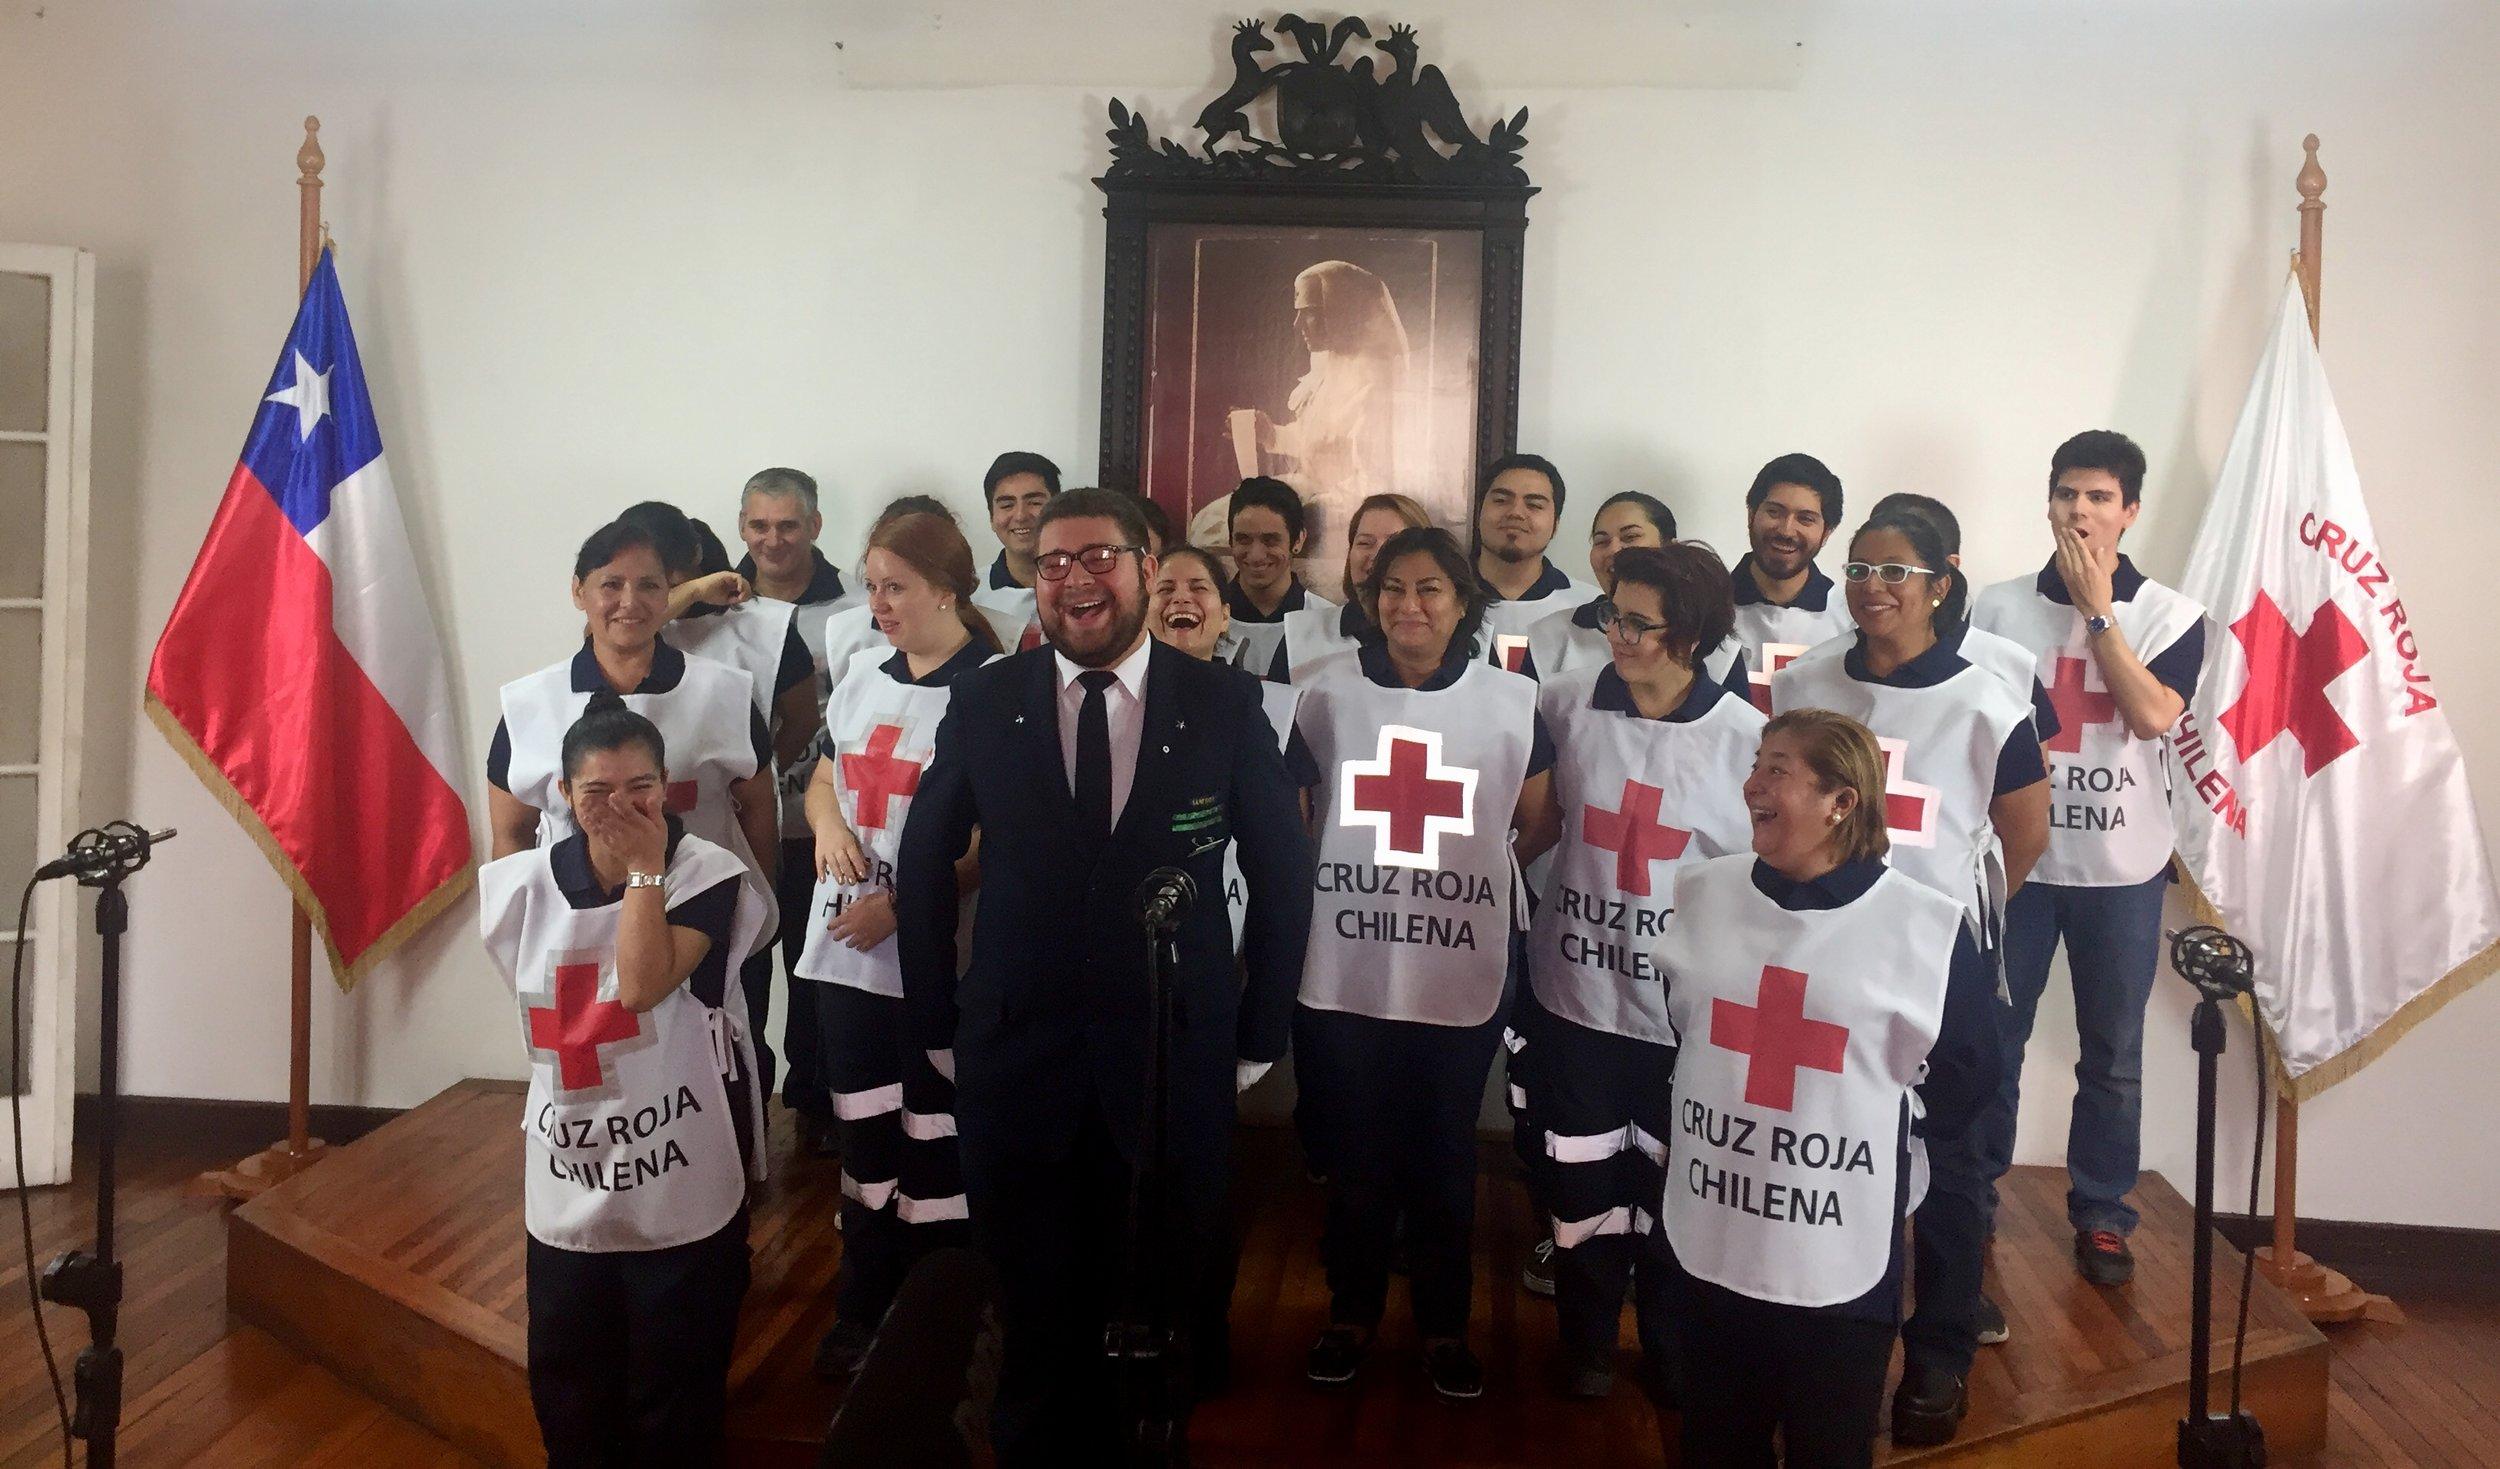 himno cruz roja chilena